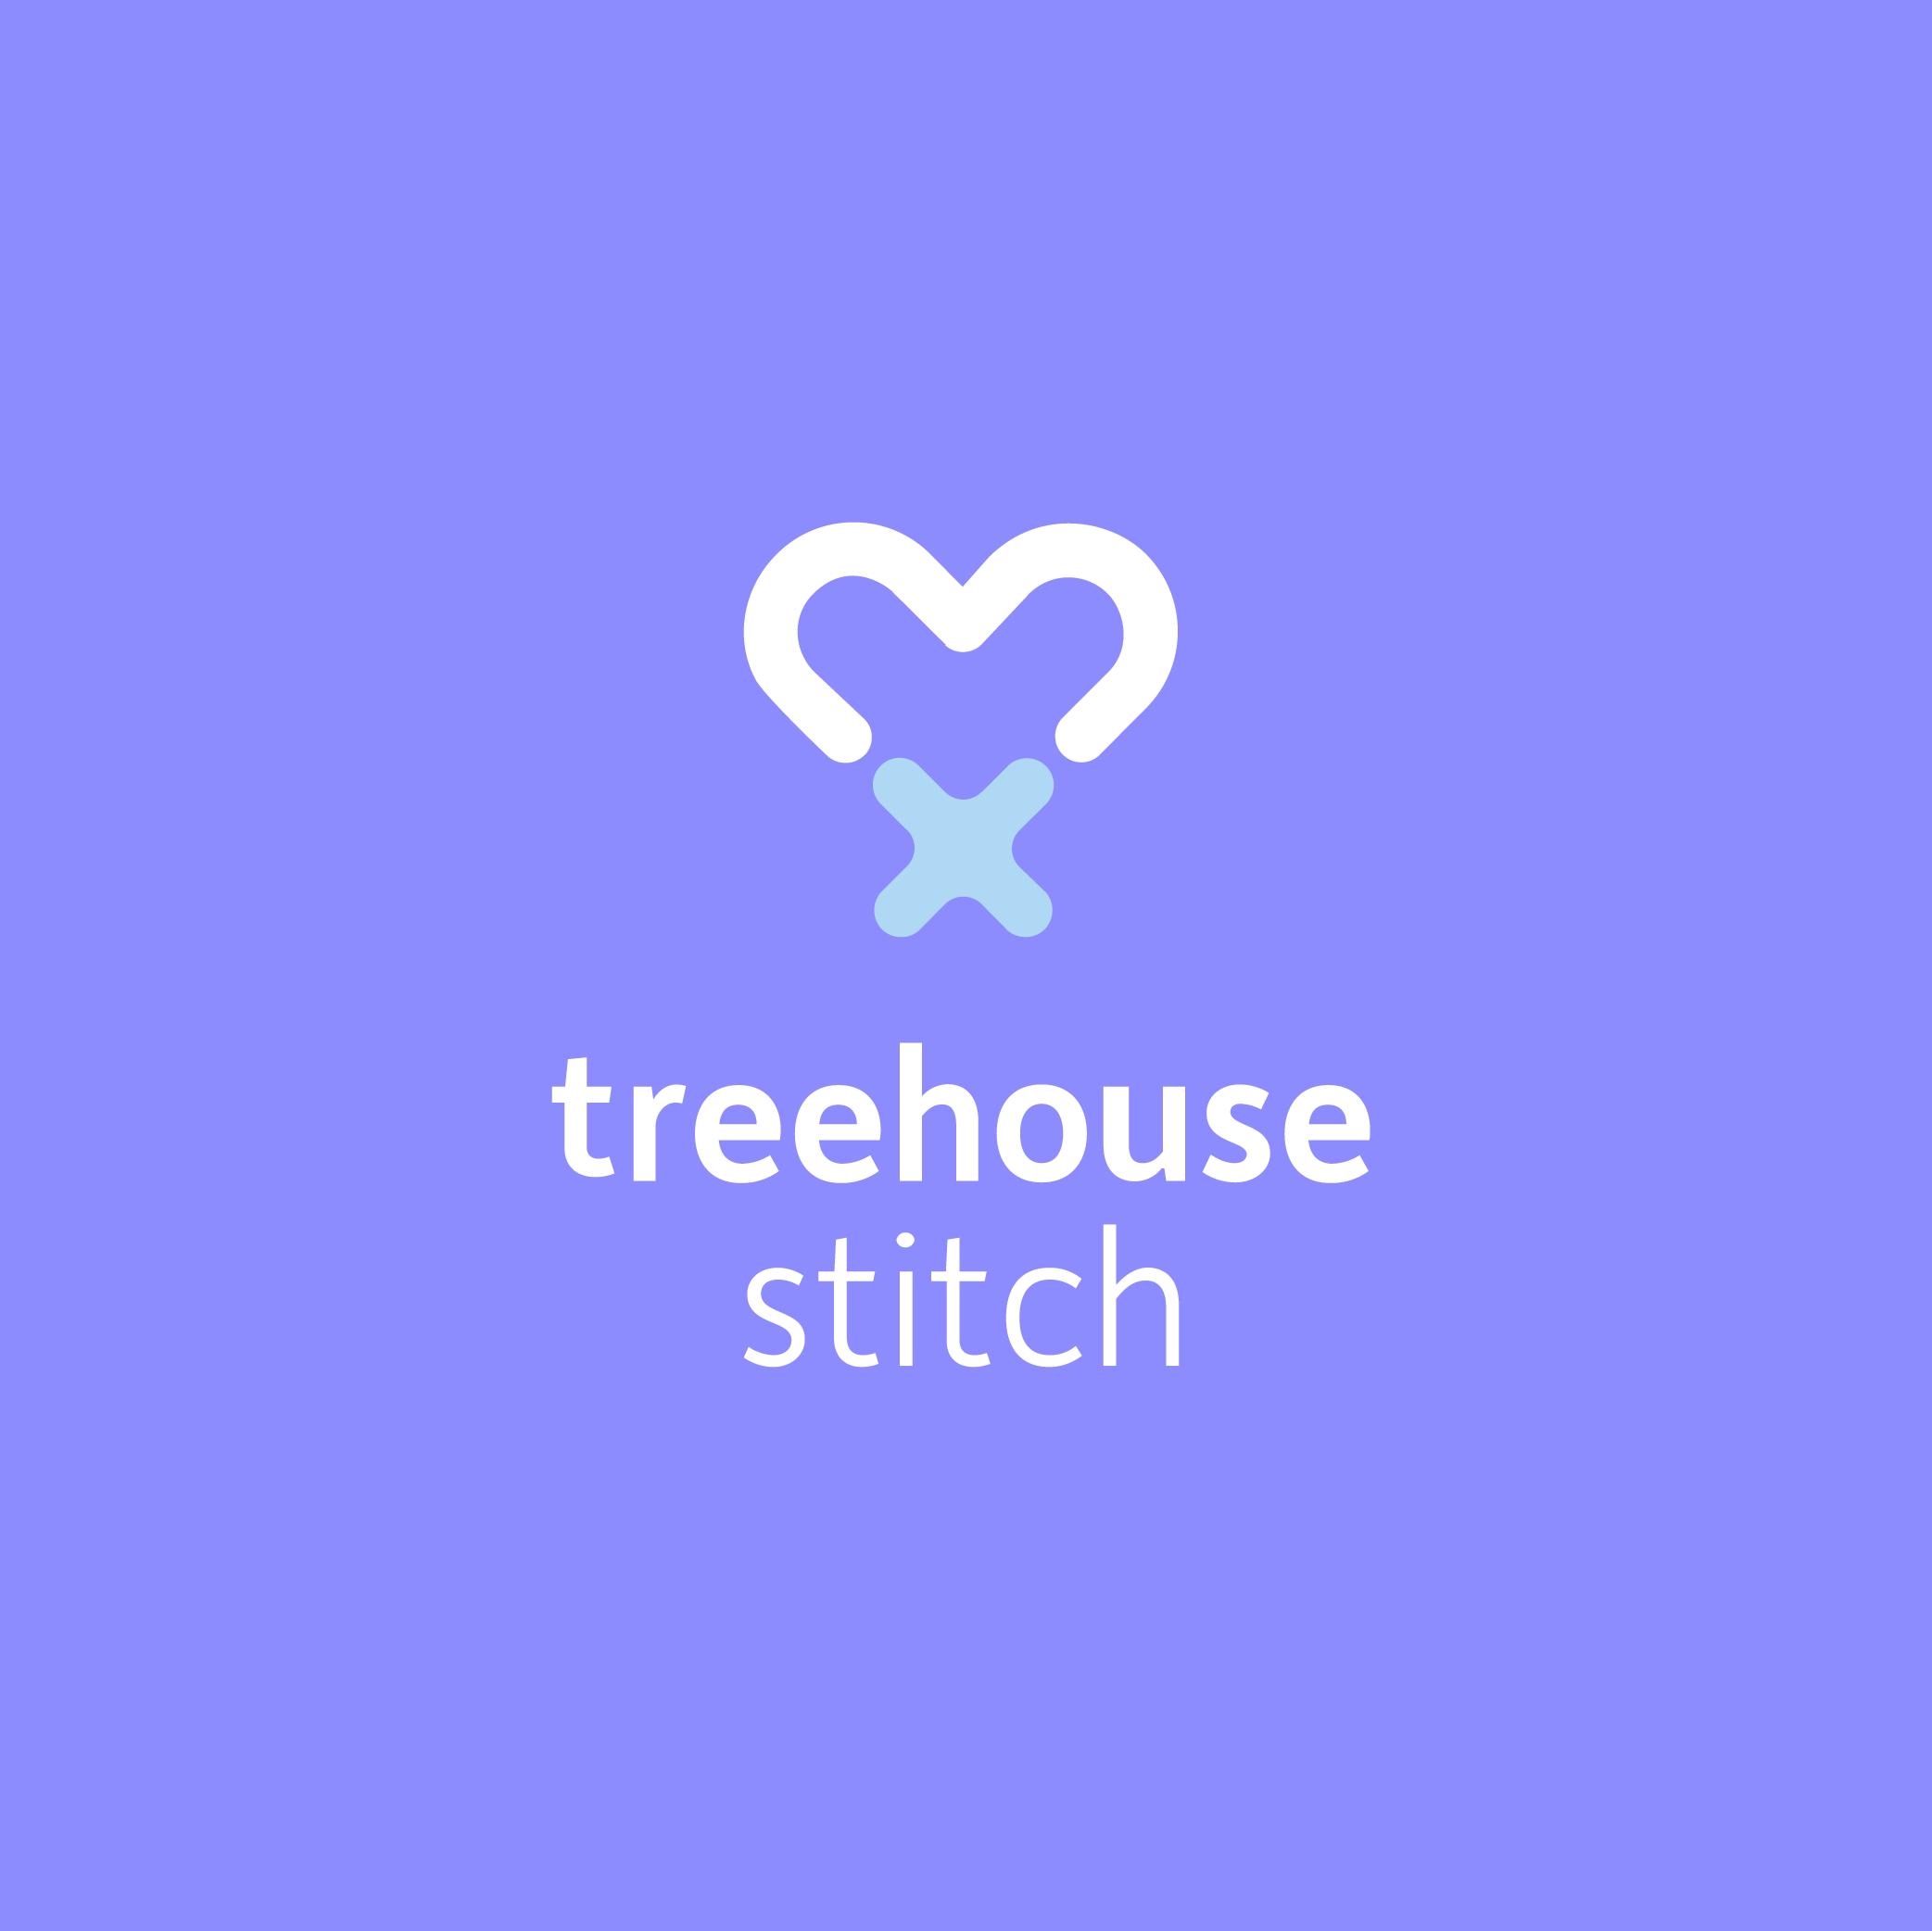 treehouse stitch logo design